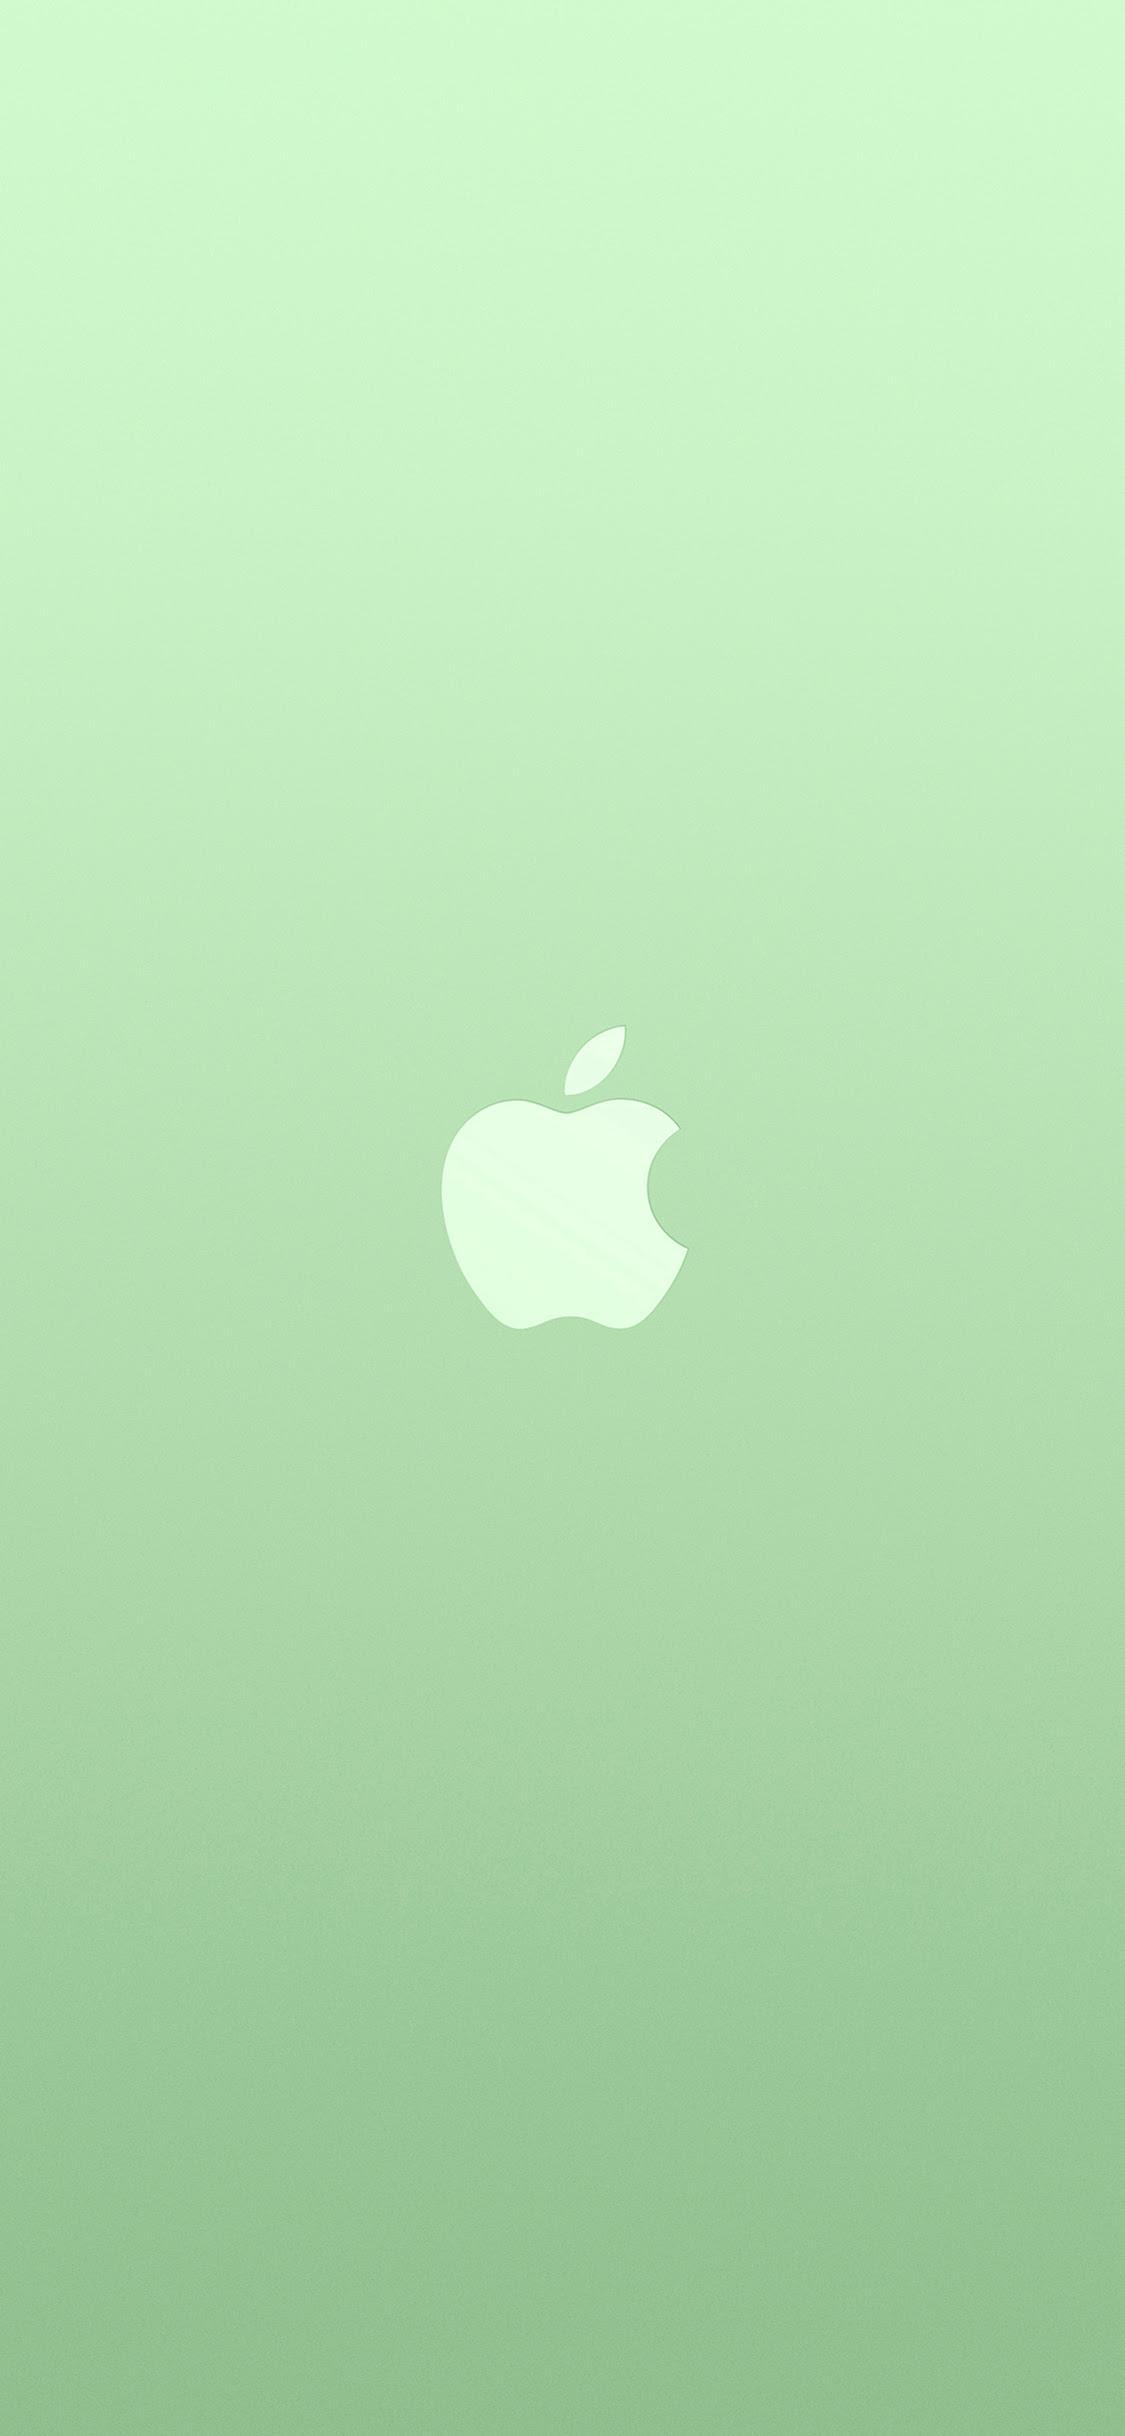 Iphonexpapers Com Iphone X Wallpaper Au18 Logo Apple Green White